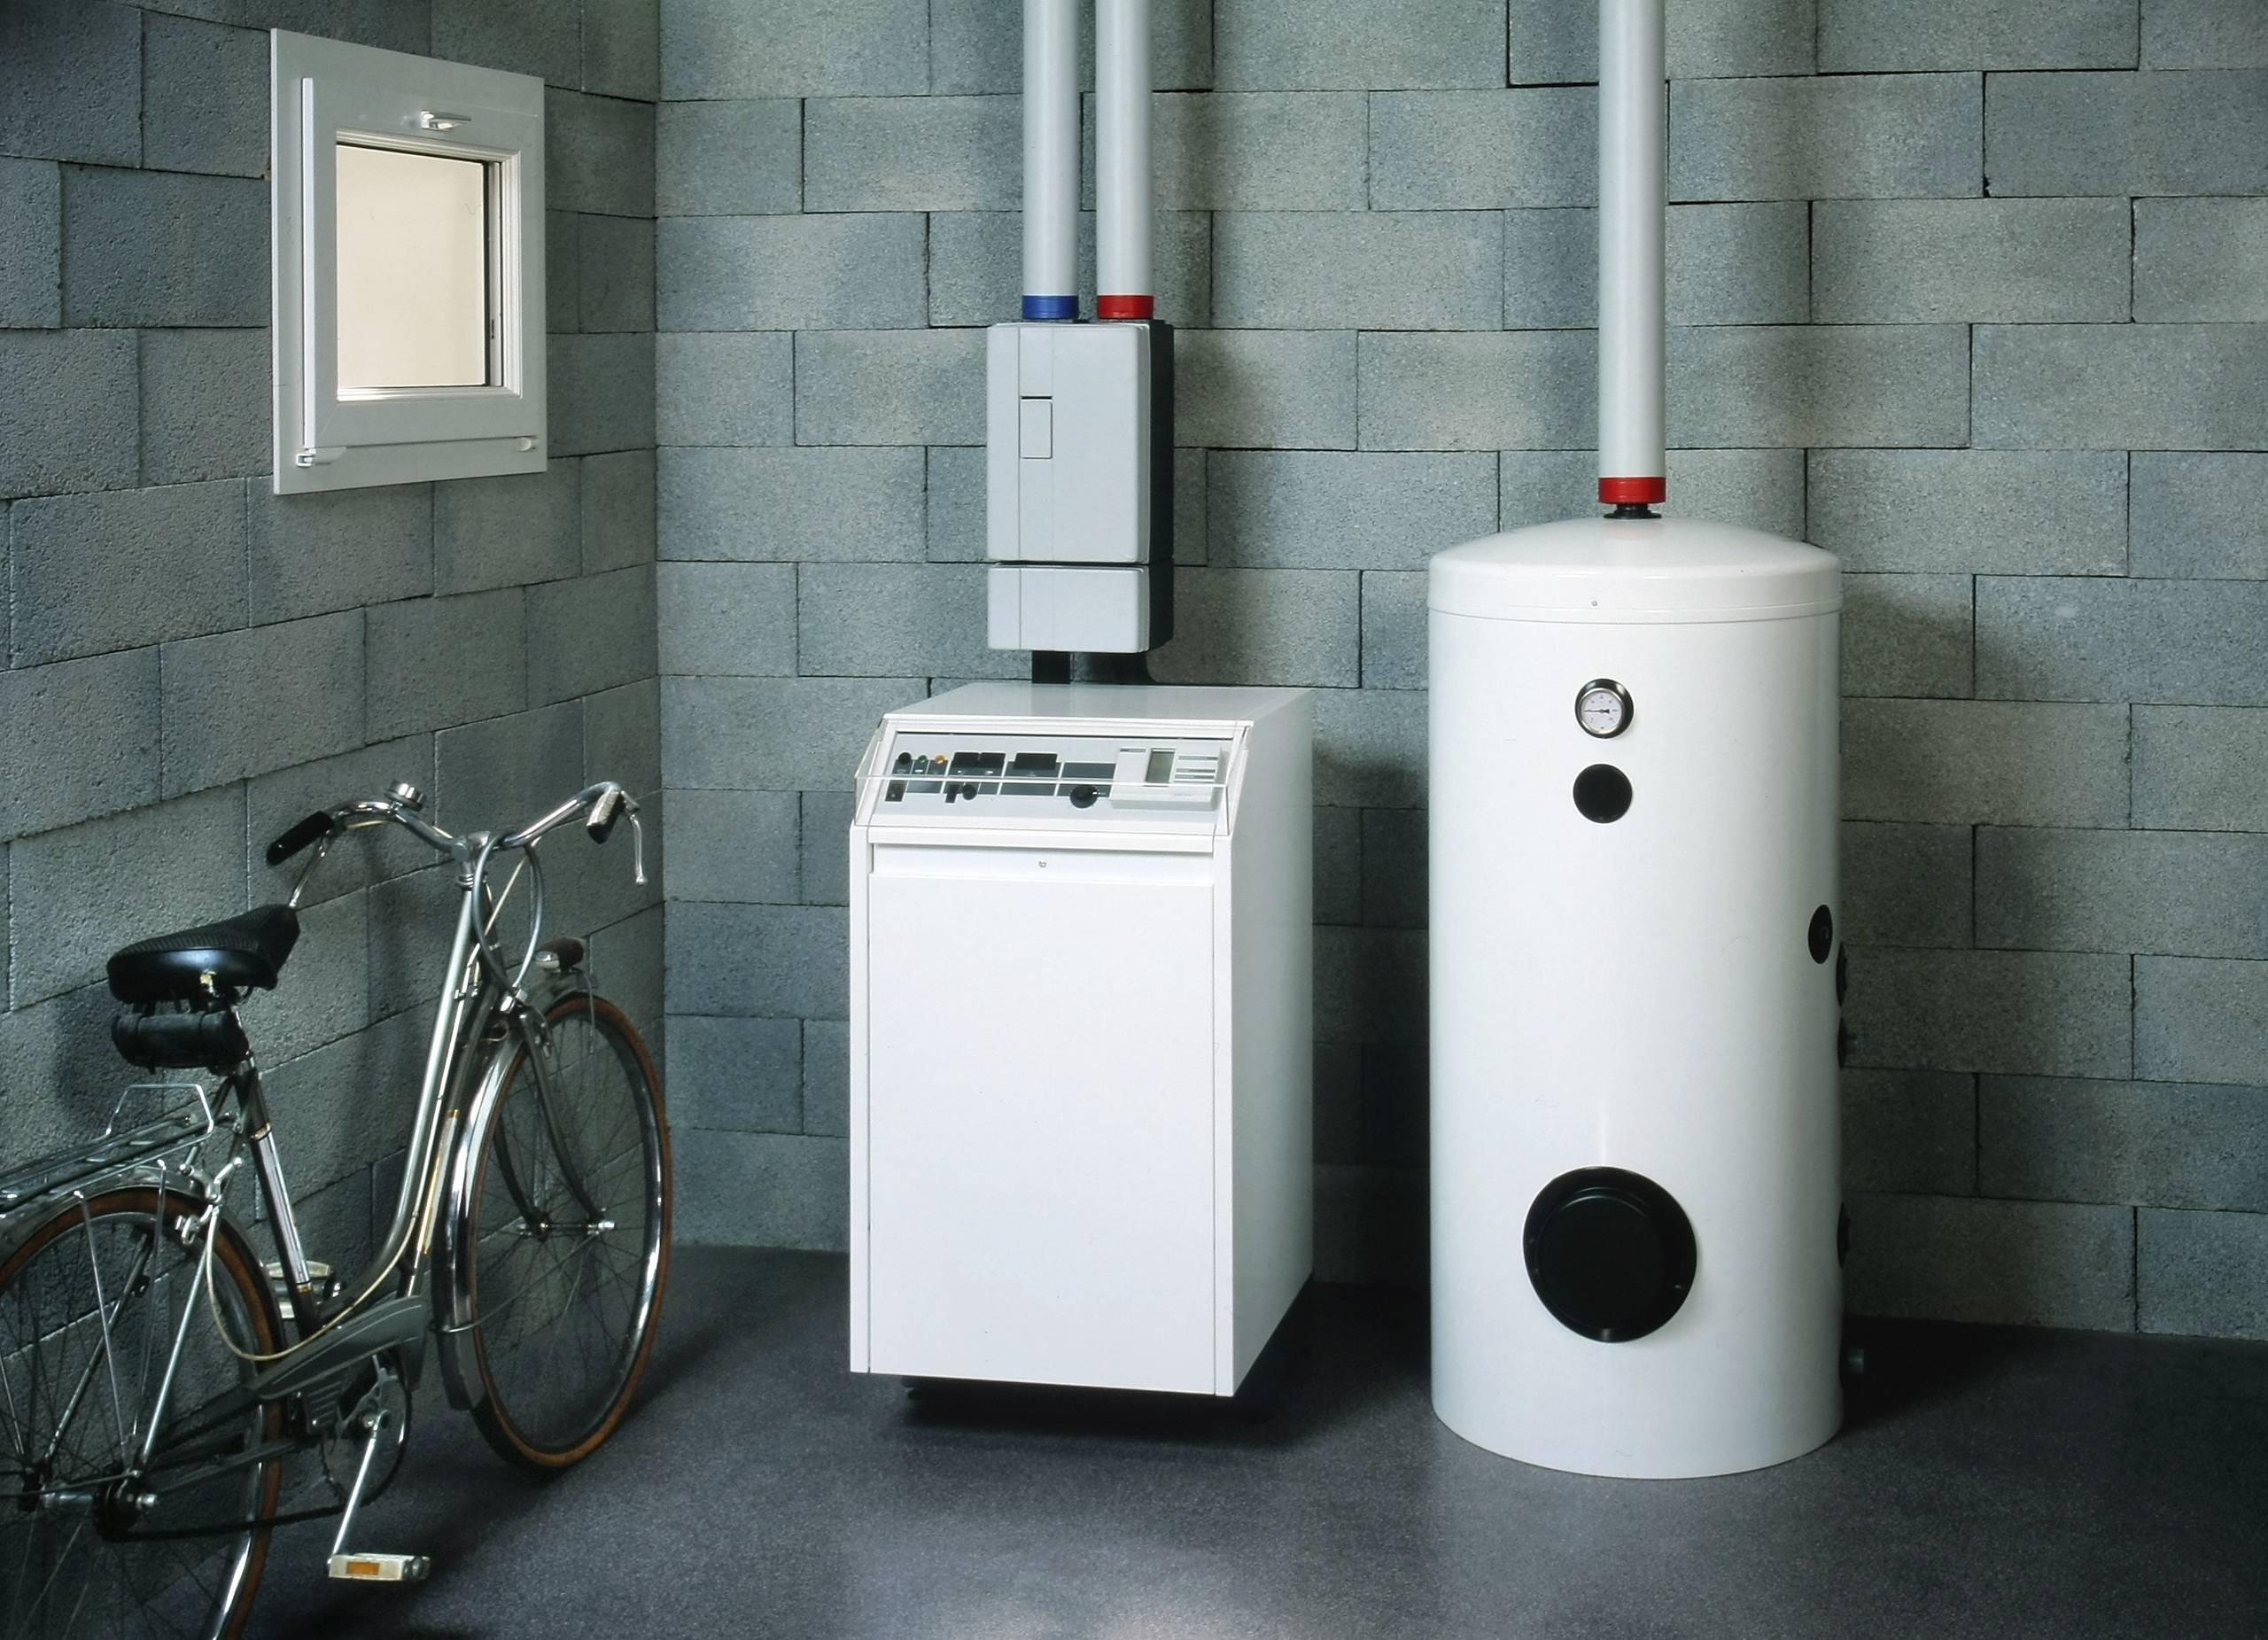 Caldaia A Condensazione Svantaggi caldaia a condensazione: cos'è, vantaggi, costi complessivi